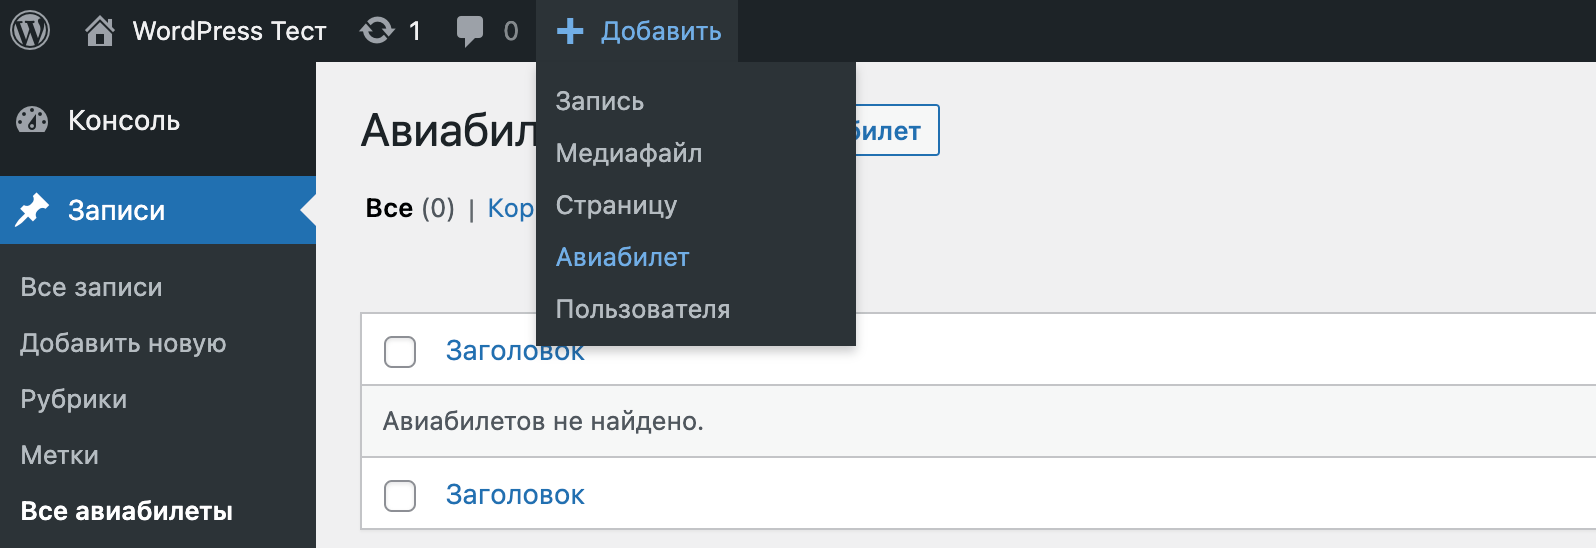 параметр show_in_admin_bar равен true